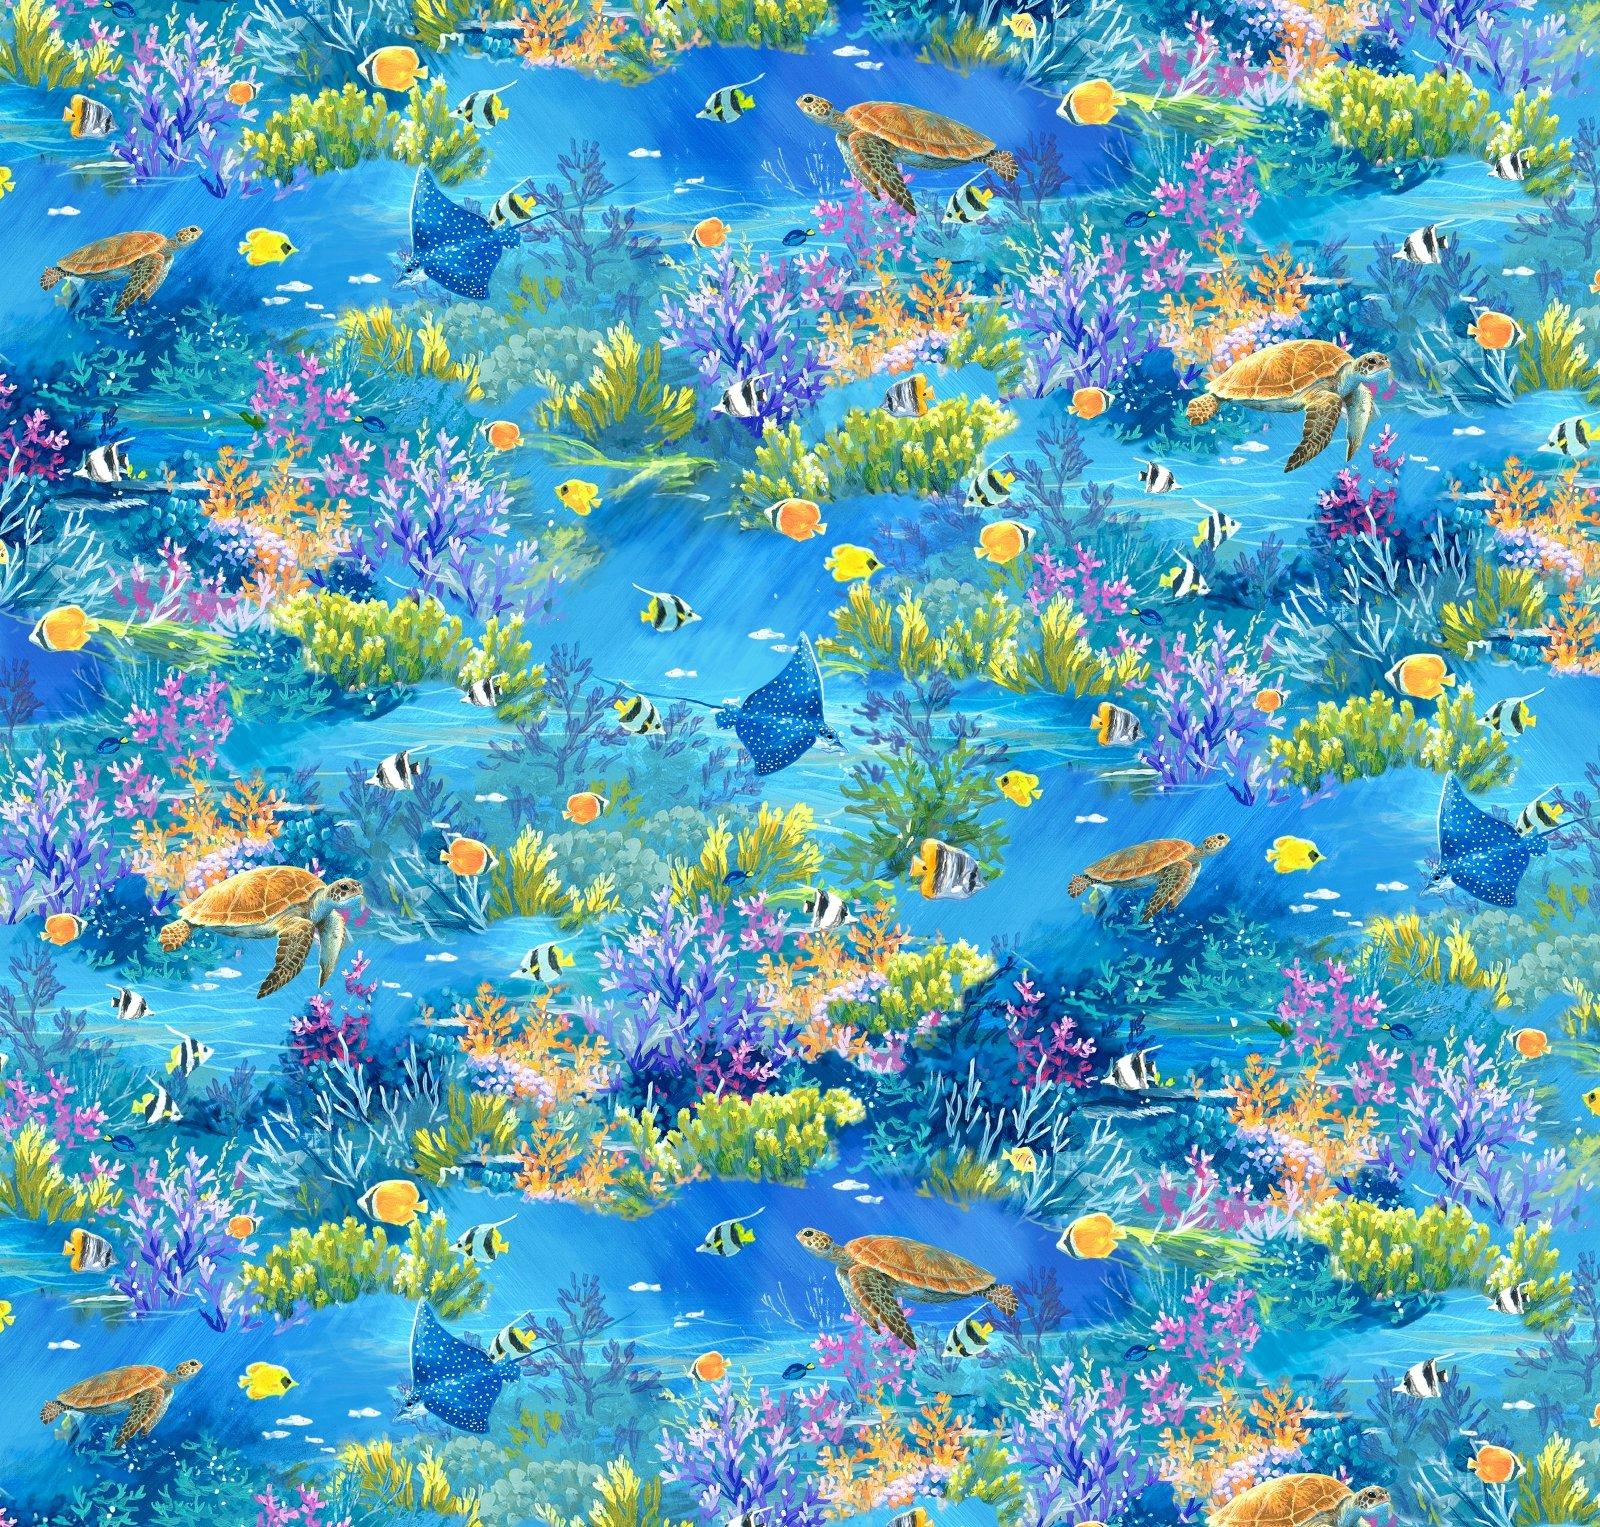 WPAR-4582 MU - WEEKEND IN PARADISE BY ABRAHAM HUNTER FISH & TURTLES - ARRIVING IN OCTOBER 2021